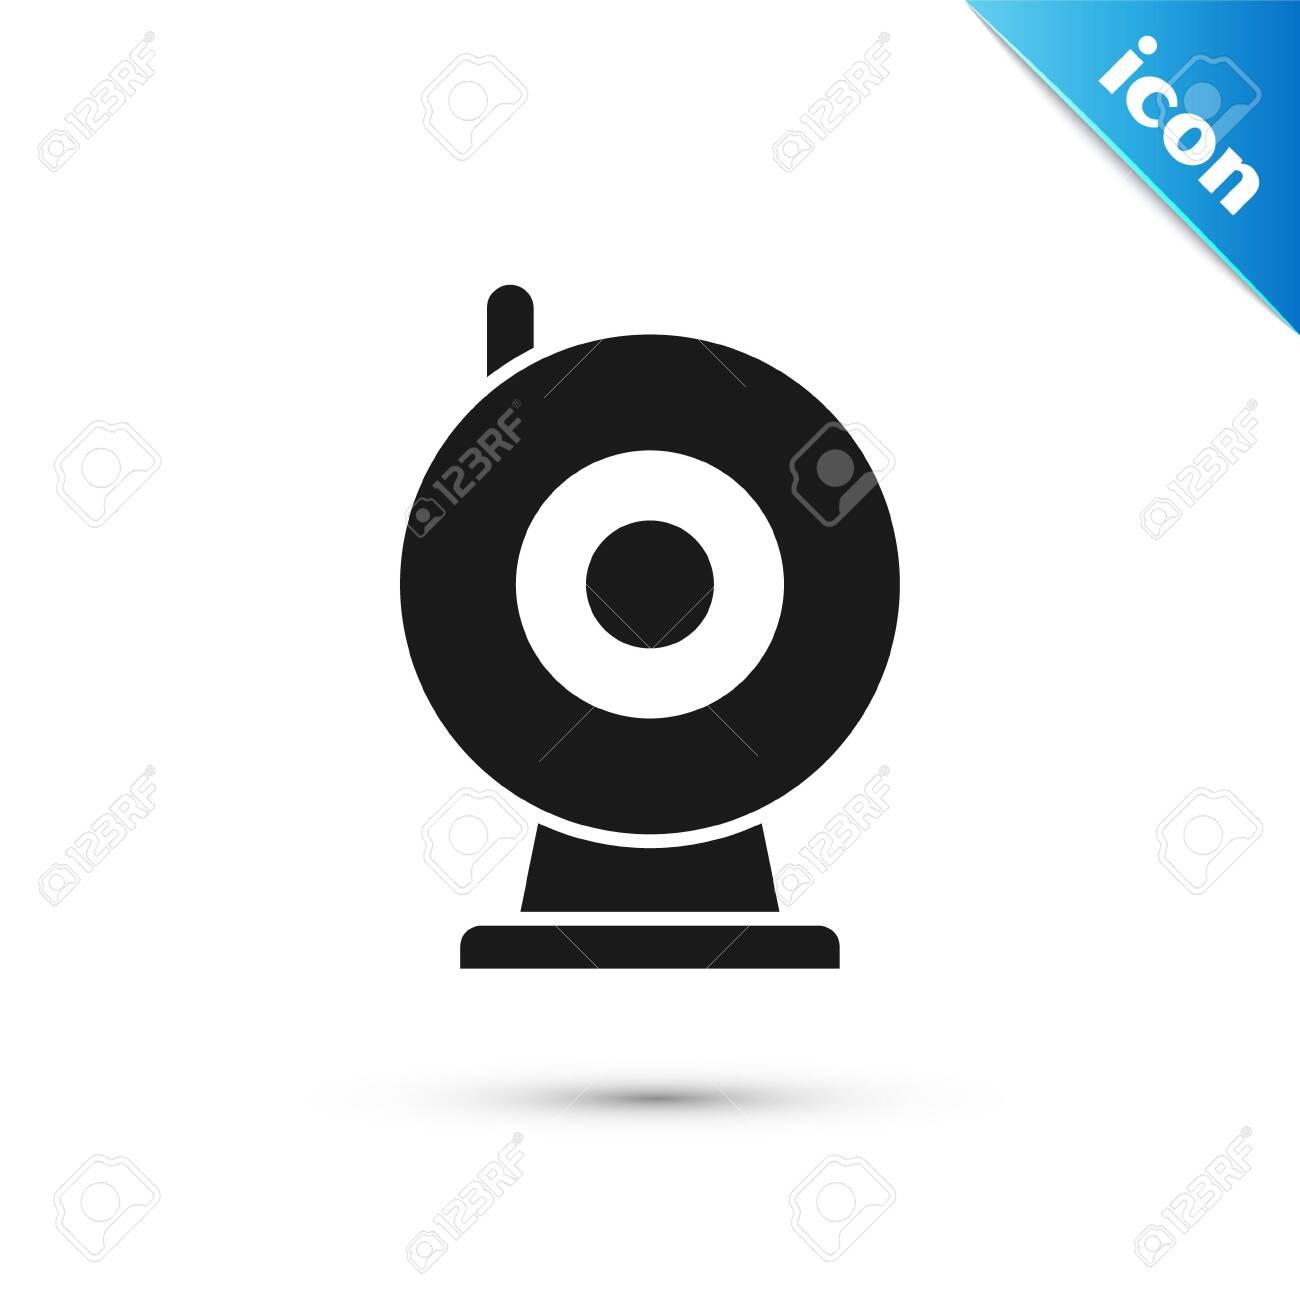 Black Web camera icon isolated on white background. Chat camera. Webcam icon. Vector Illustration - 137275888